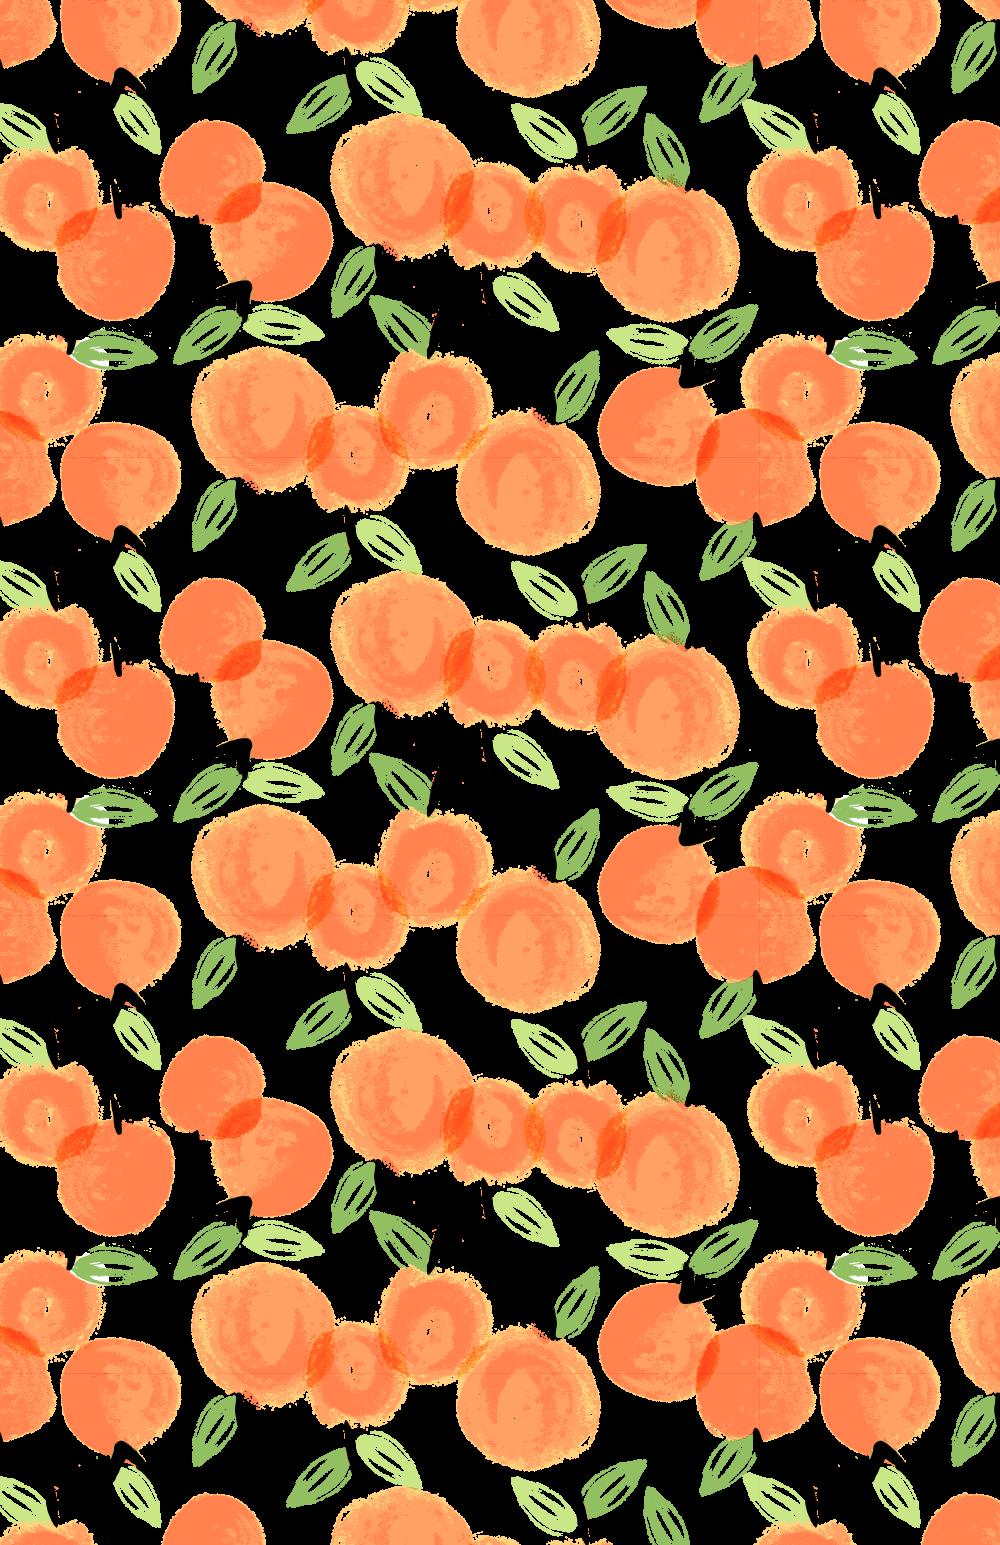 Adorable little print would. Notebook clipart orange